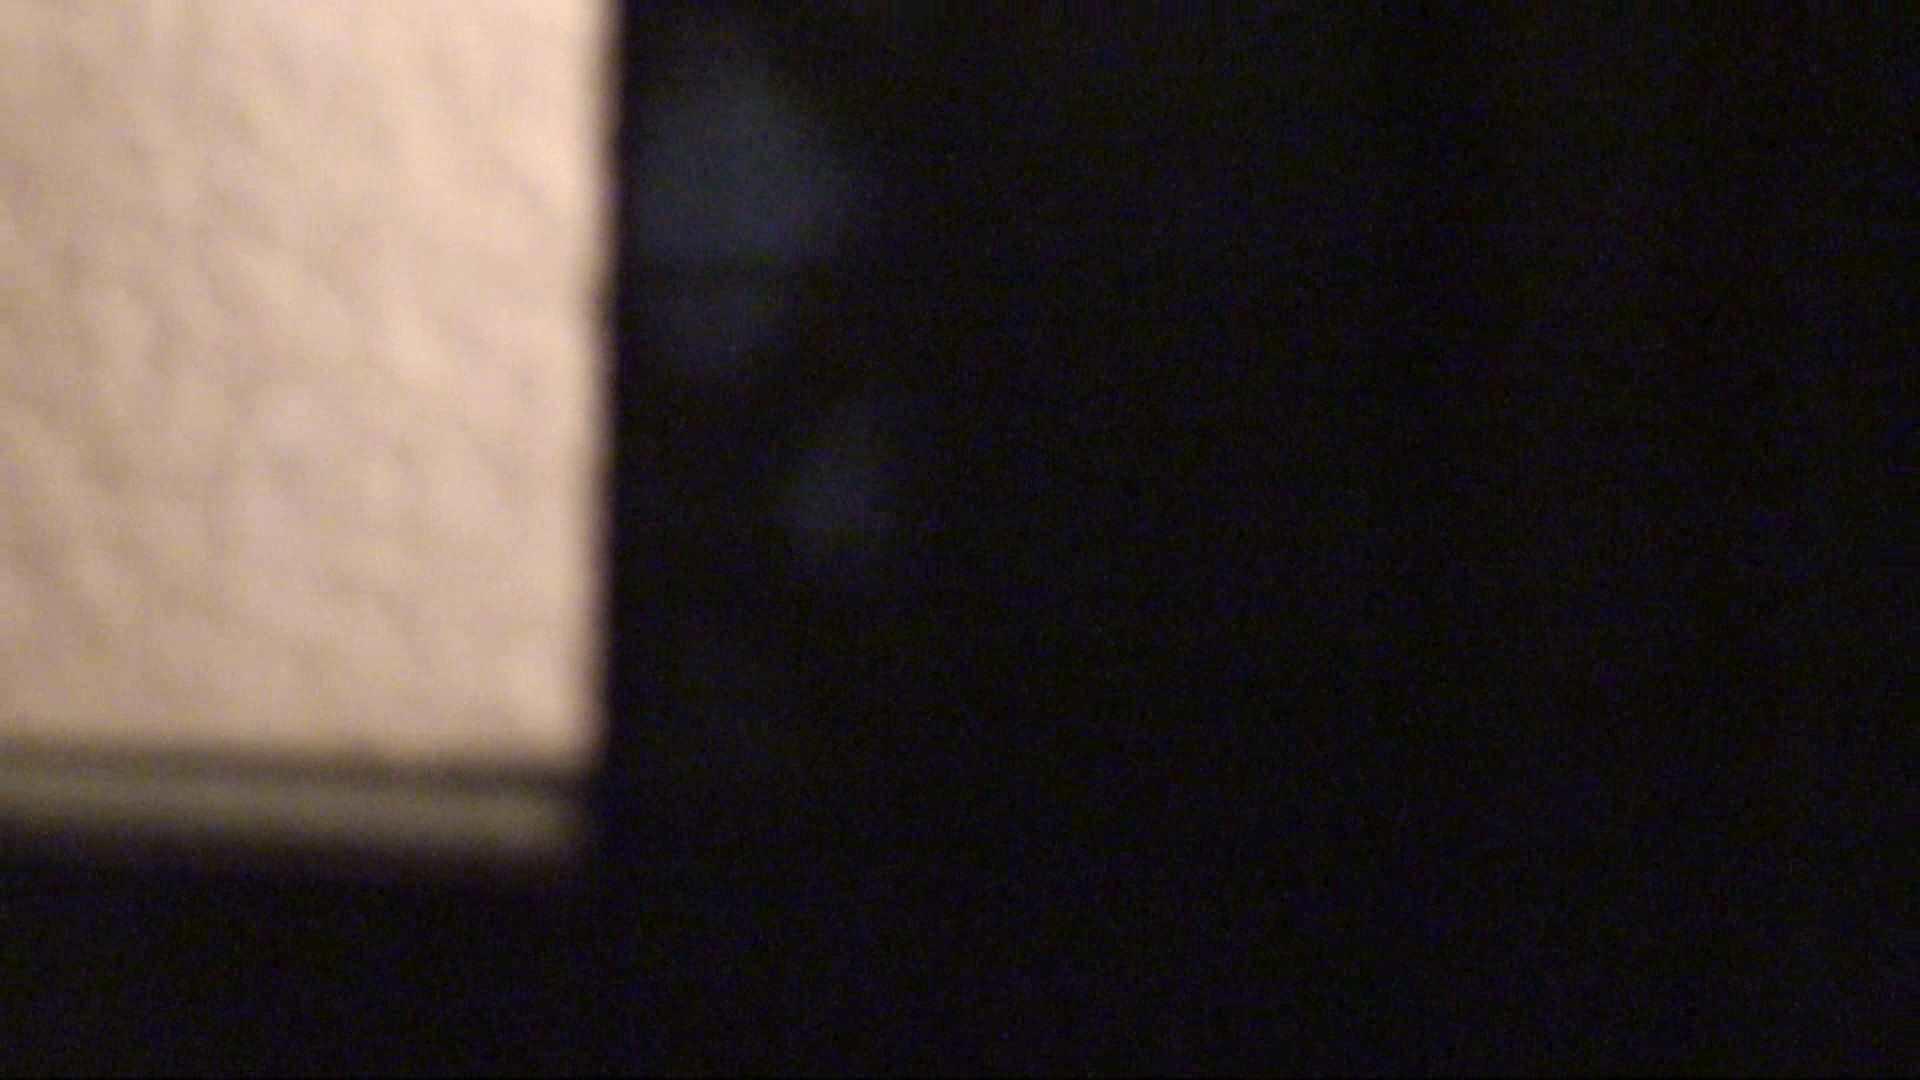 vol.01必見!白肌嬢の乳首が丸見え。極上美人のすっぴん顔をハイビジョンで! ギャルの乳首 AV無料動画キャプチャ 71画像 16